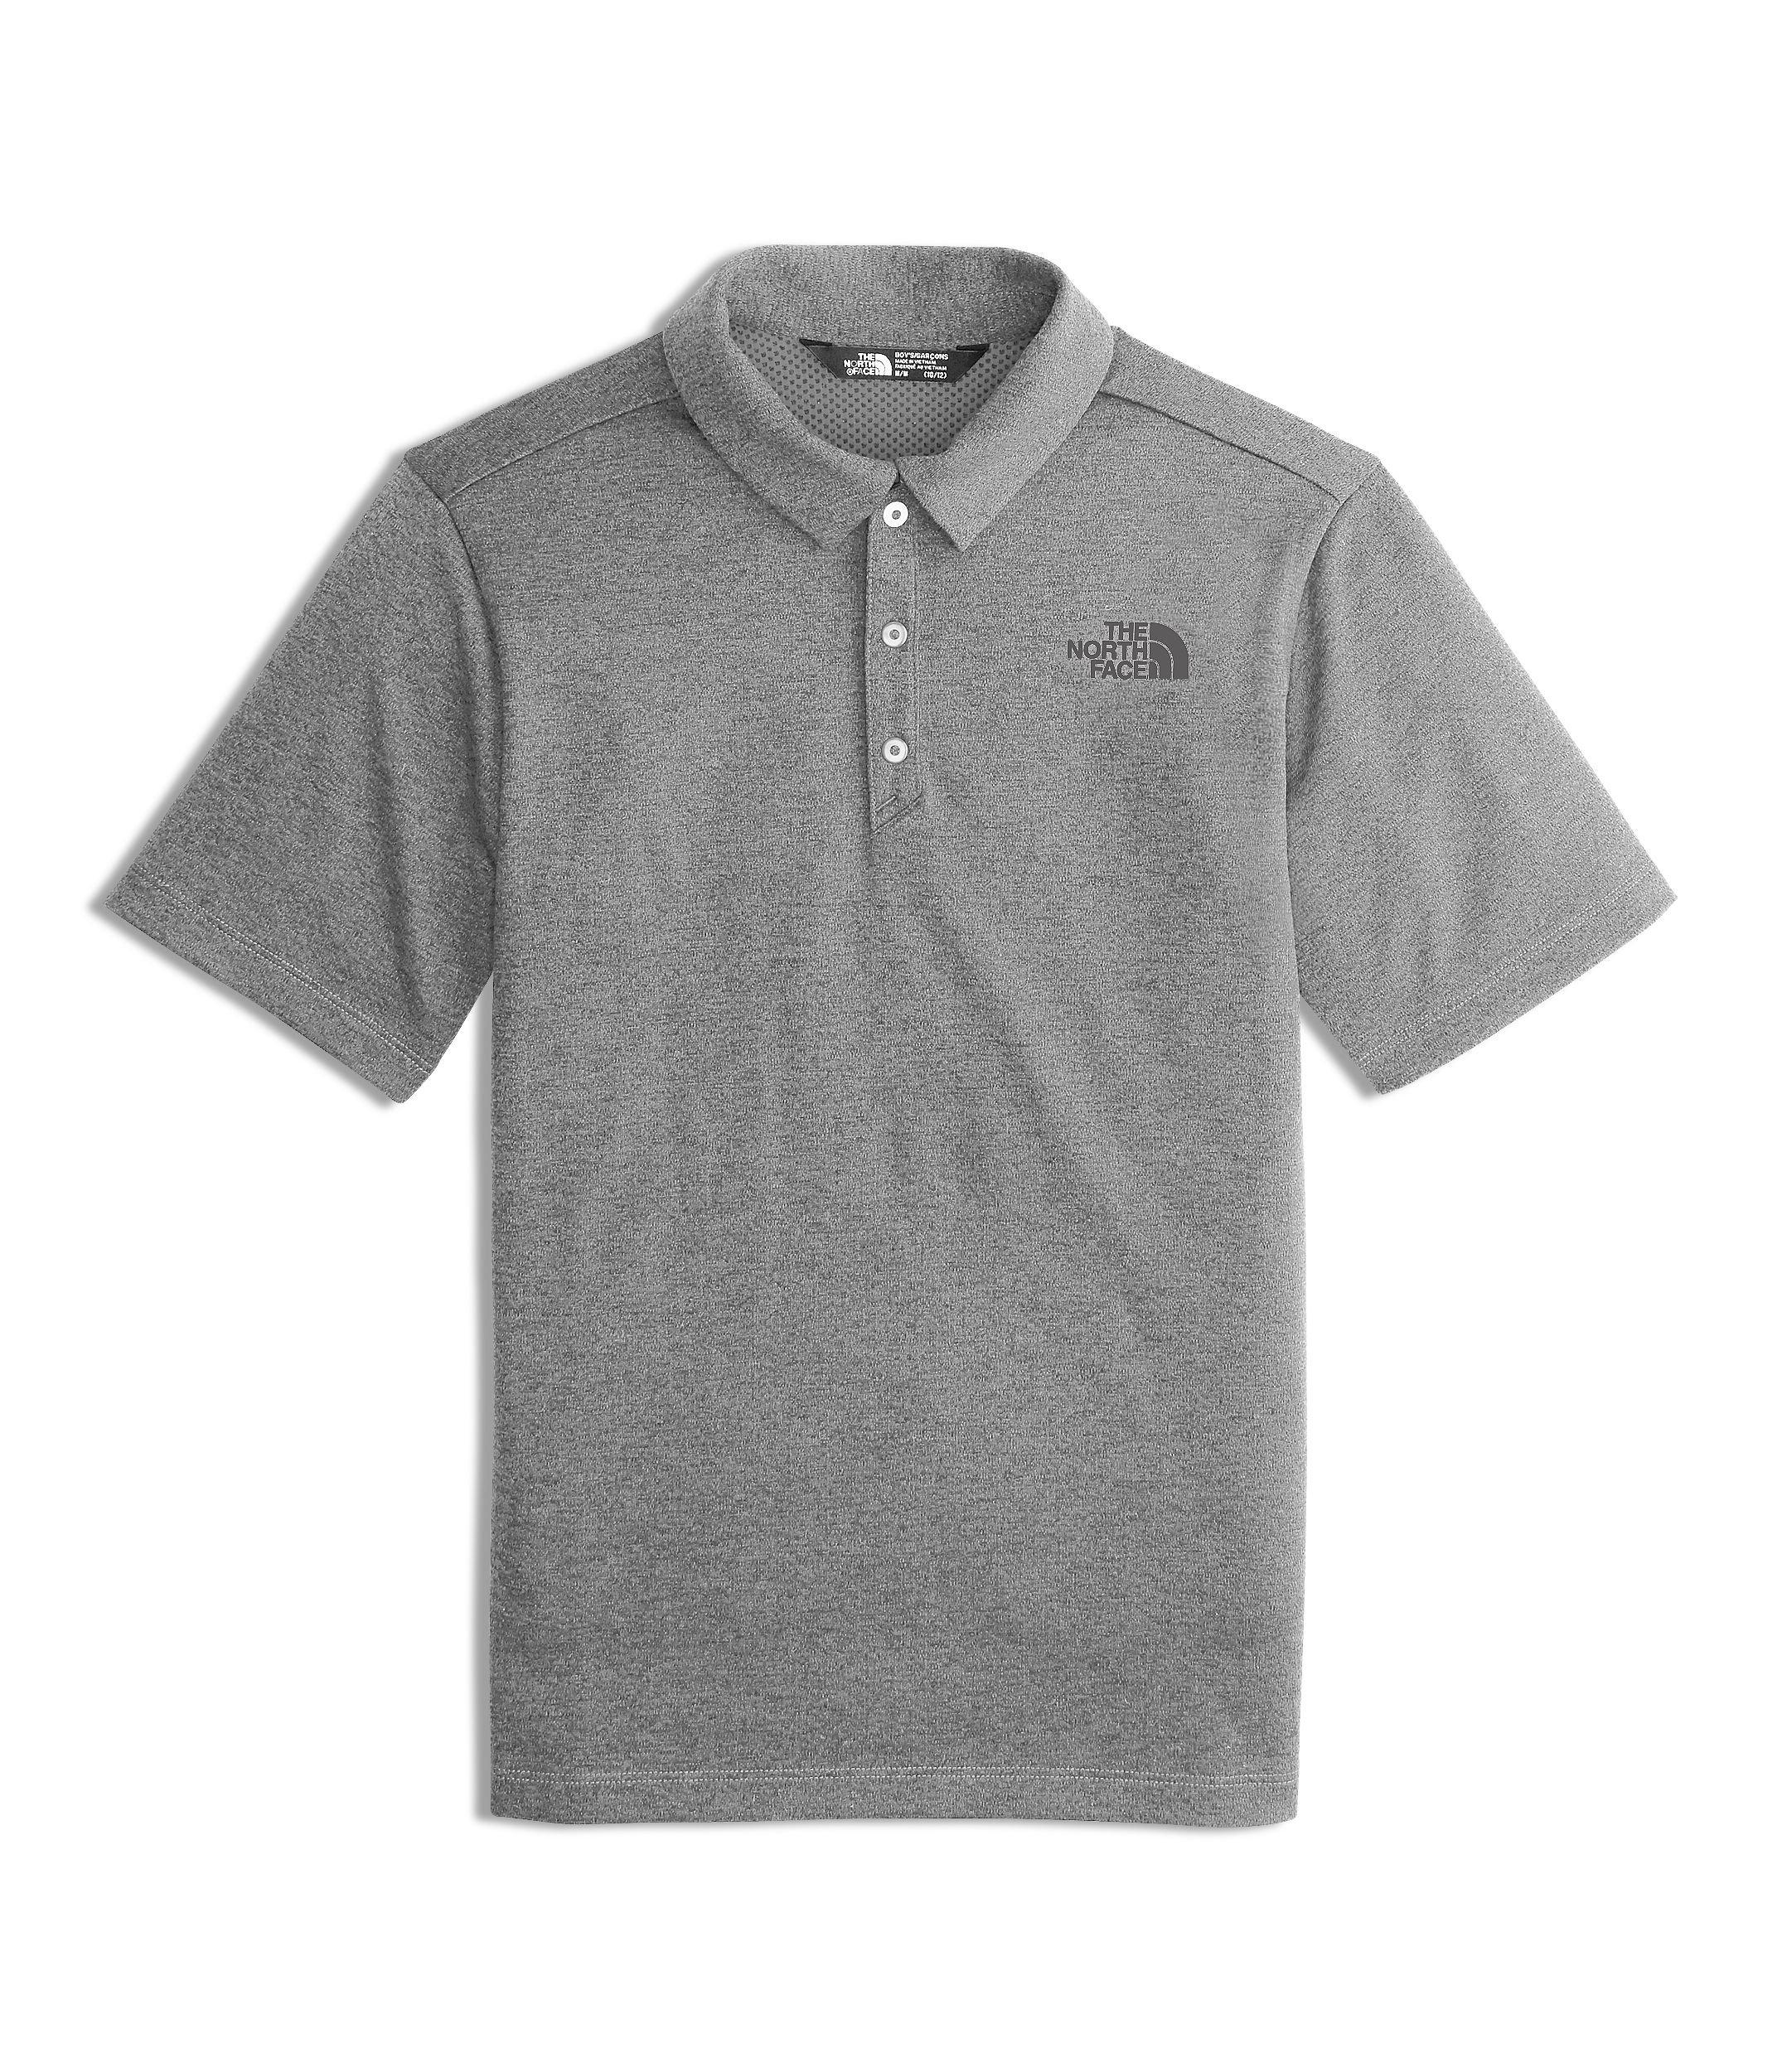 The North Face Boy's Polo Shirt - TNF Medium Grey Heather - L